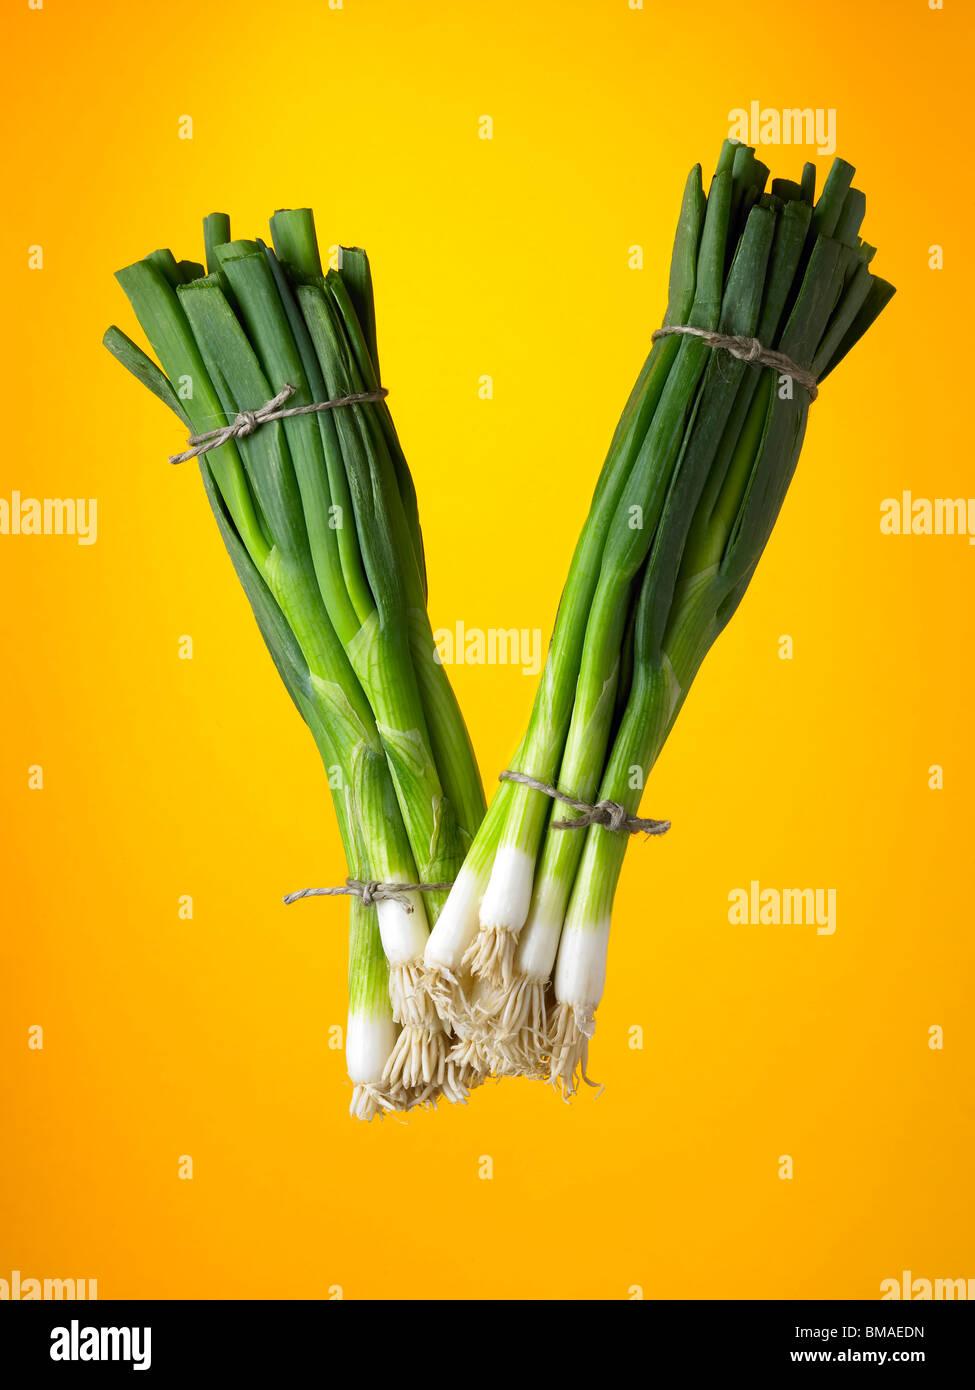 food letter V Stock Photo - Alamy